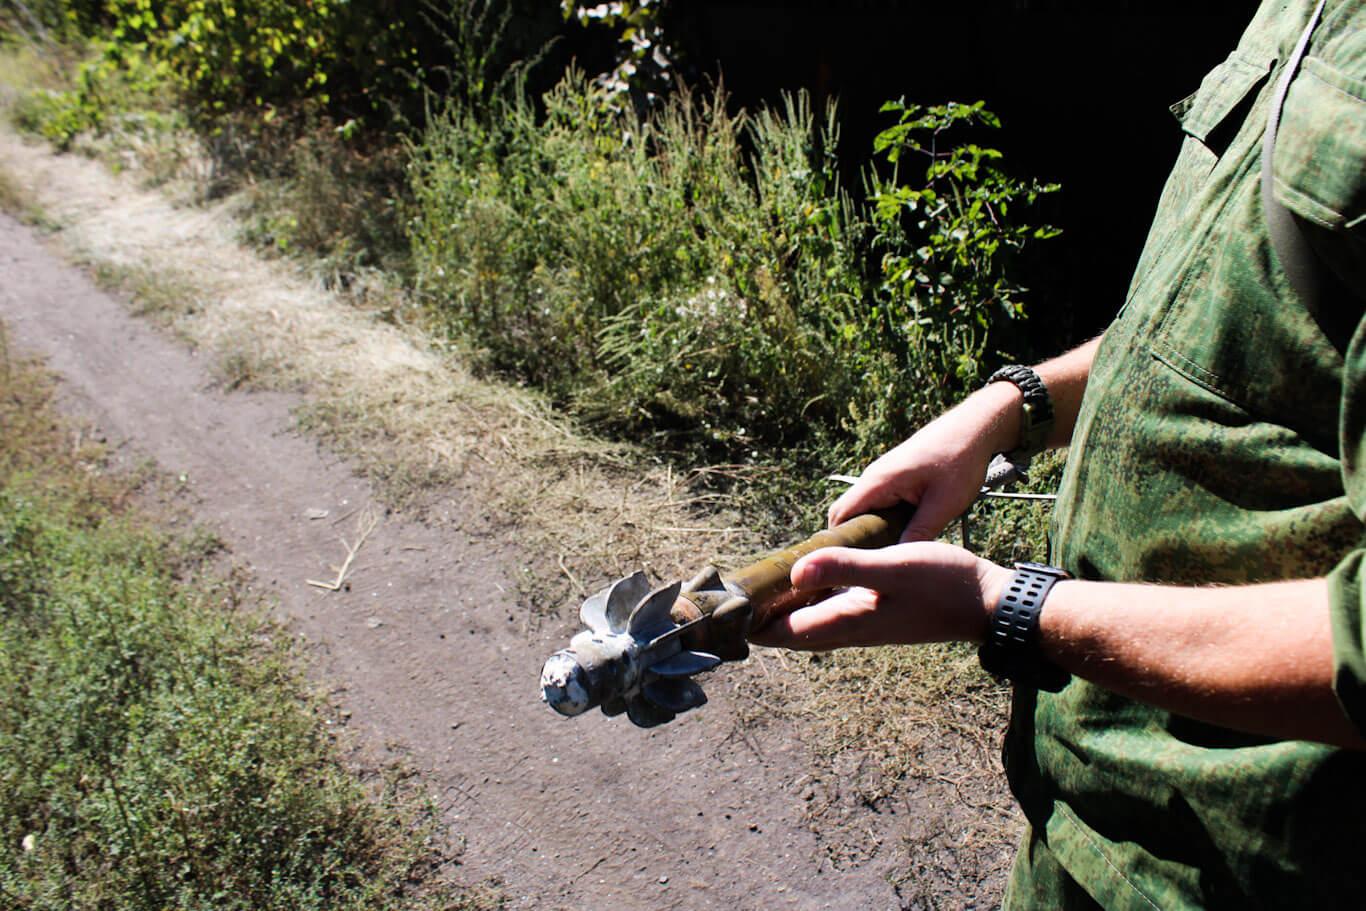 Donbass War Diary Mortar